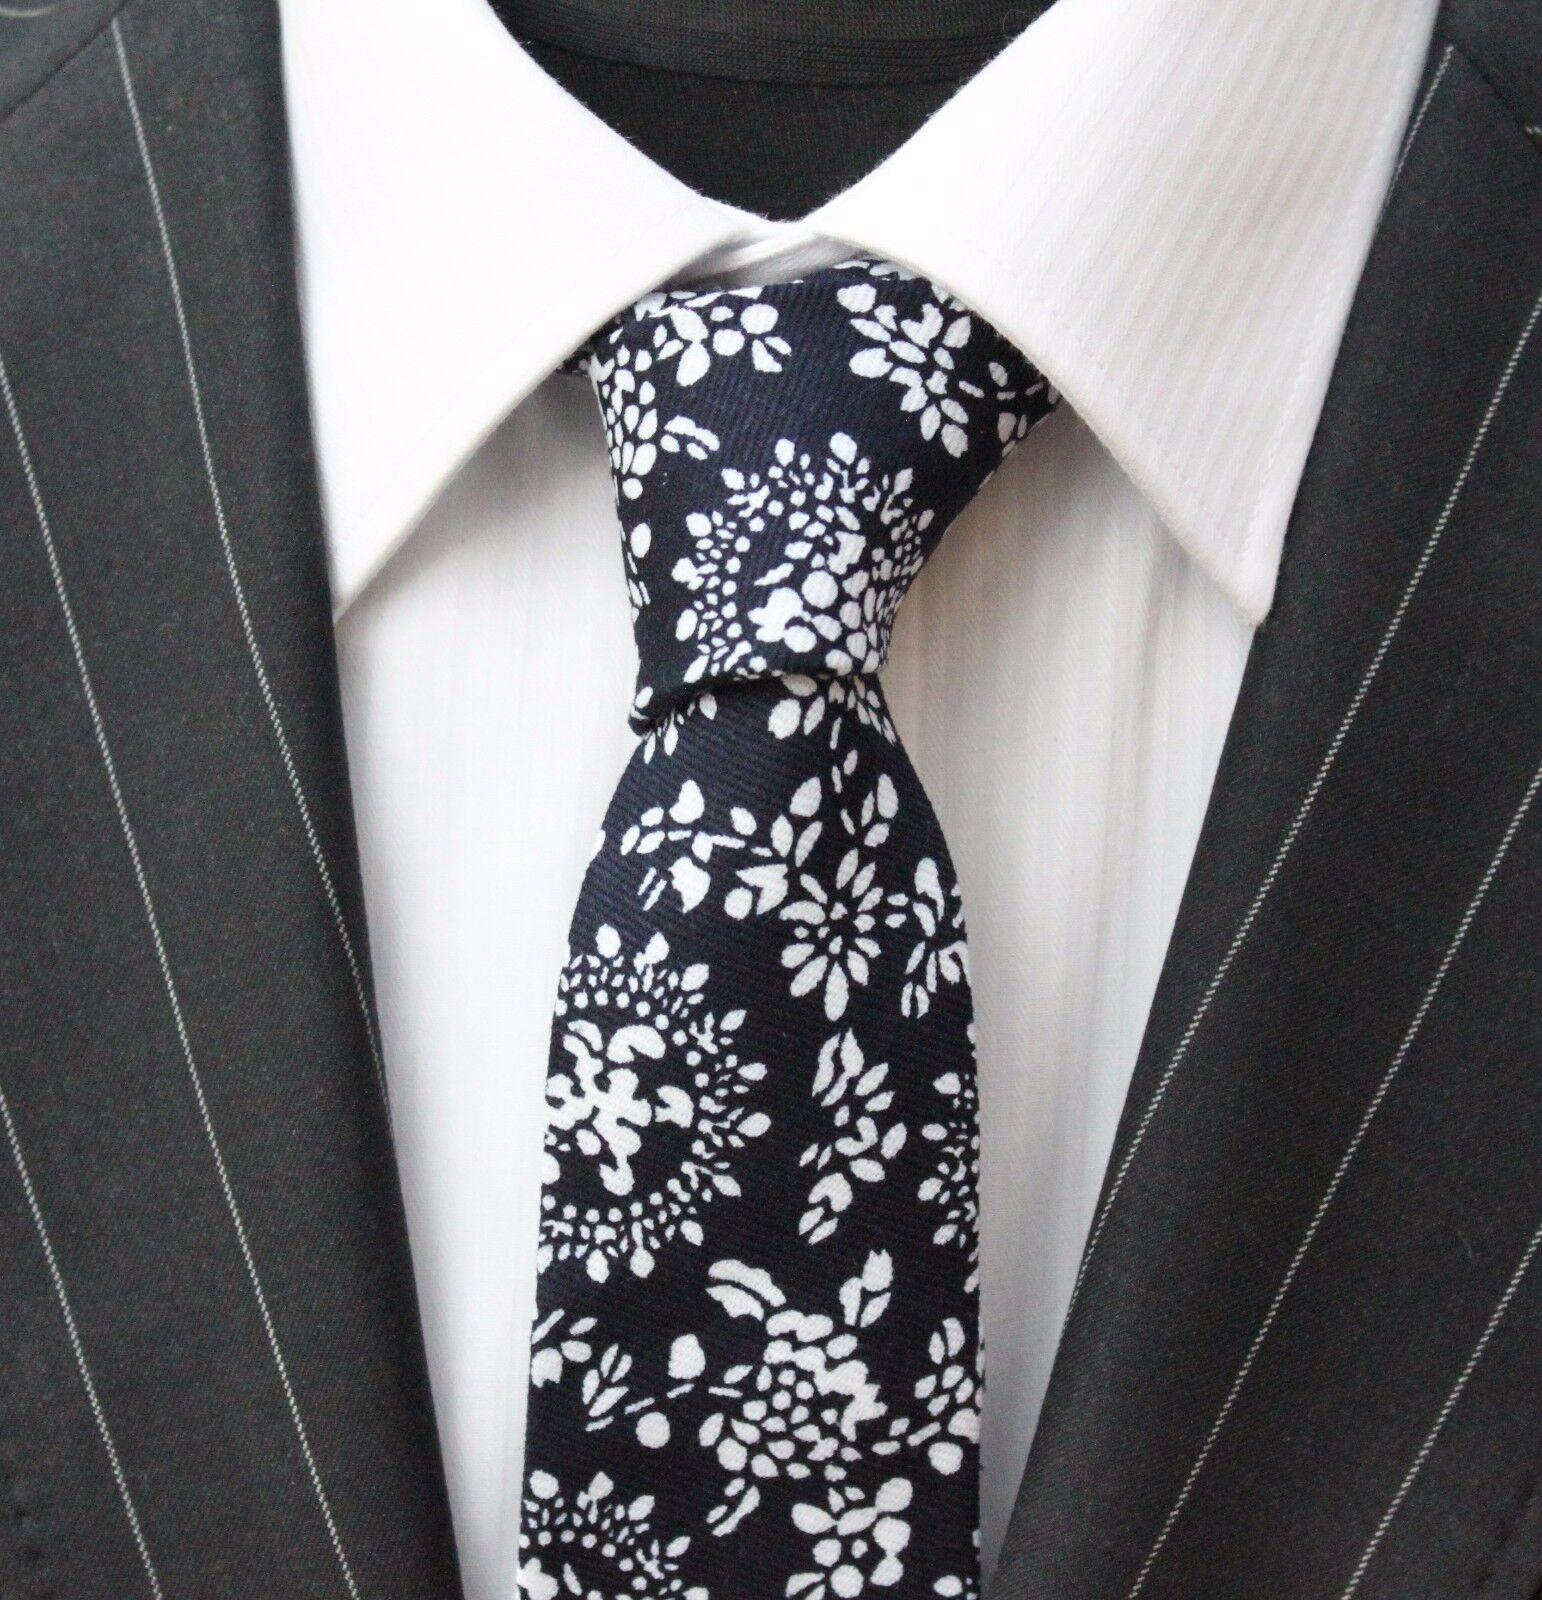 Tie Neck tie Slim Black With White Floral Quality Cotton T6136